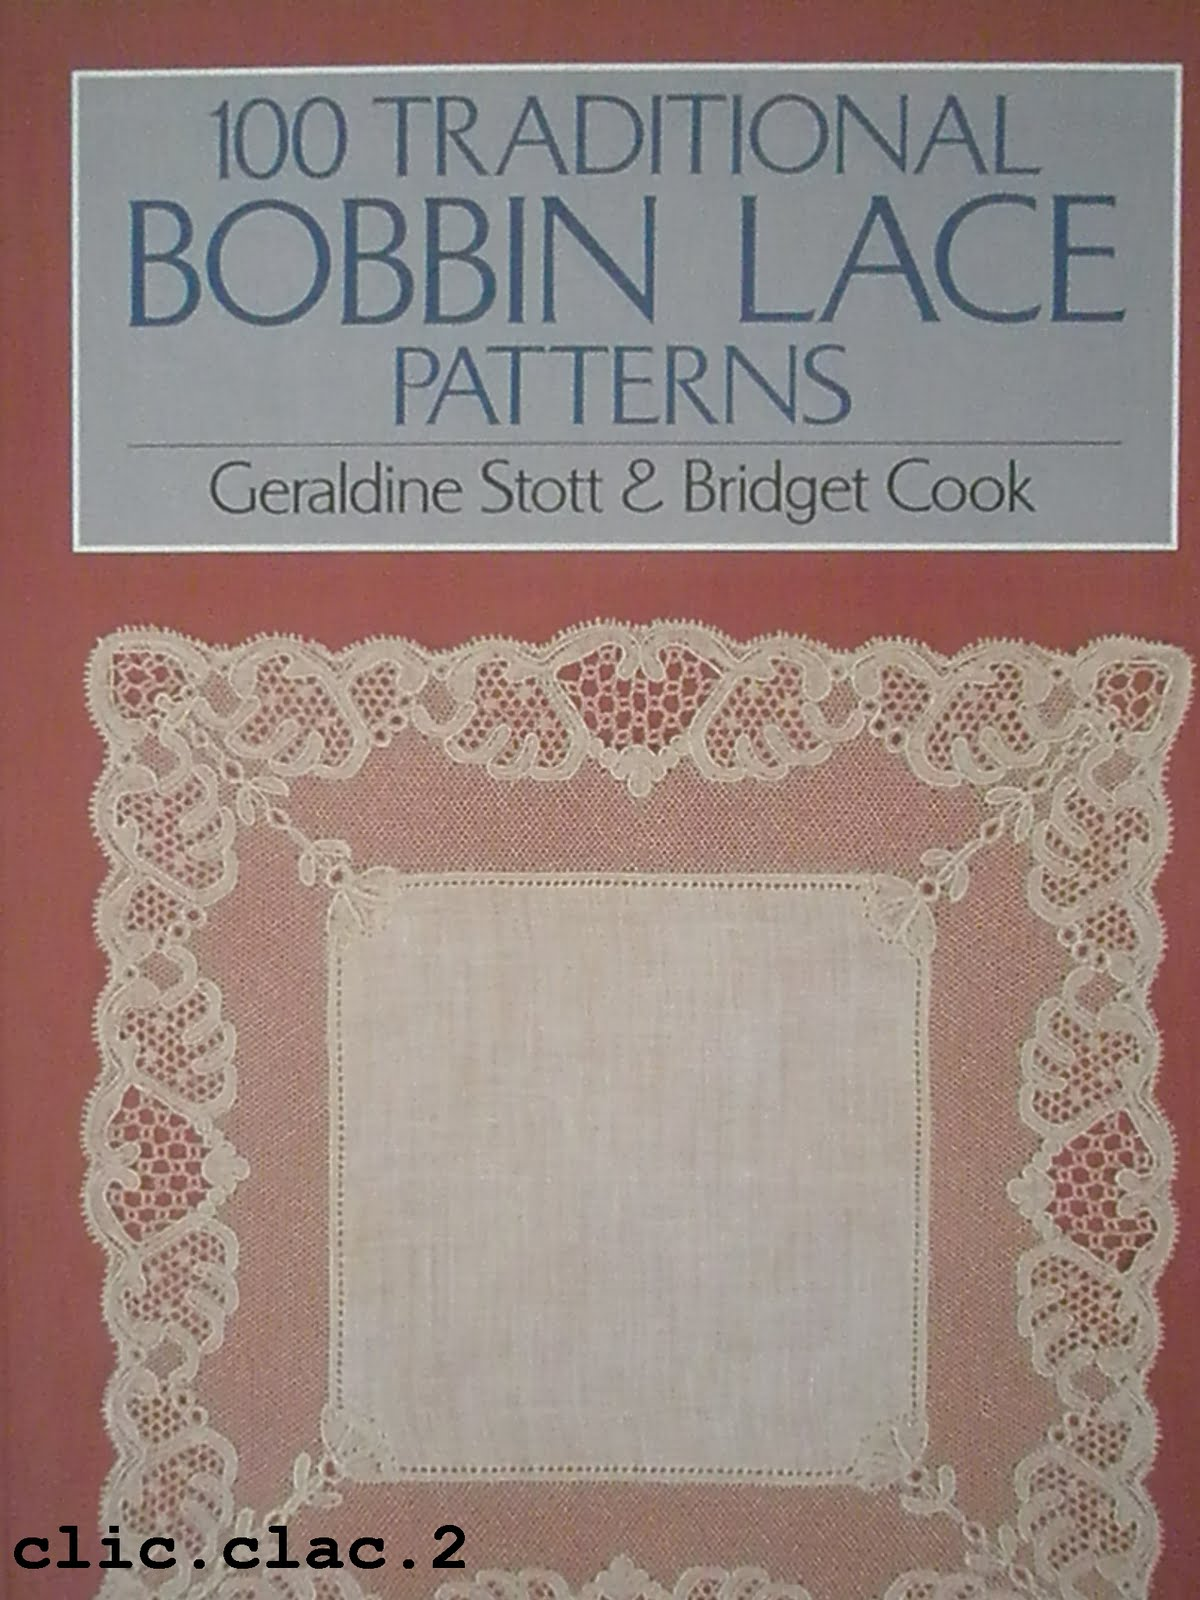 100 traditional bobbin lace patterns - geraldine stott & bridget cook